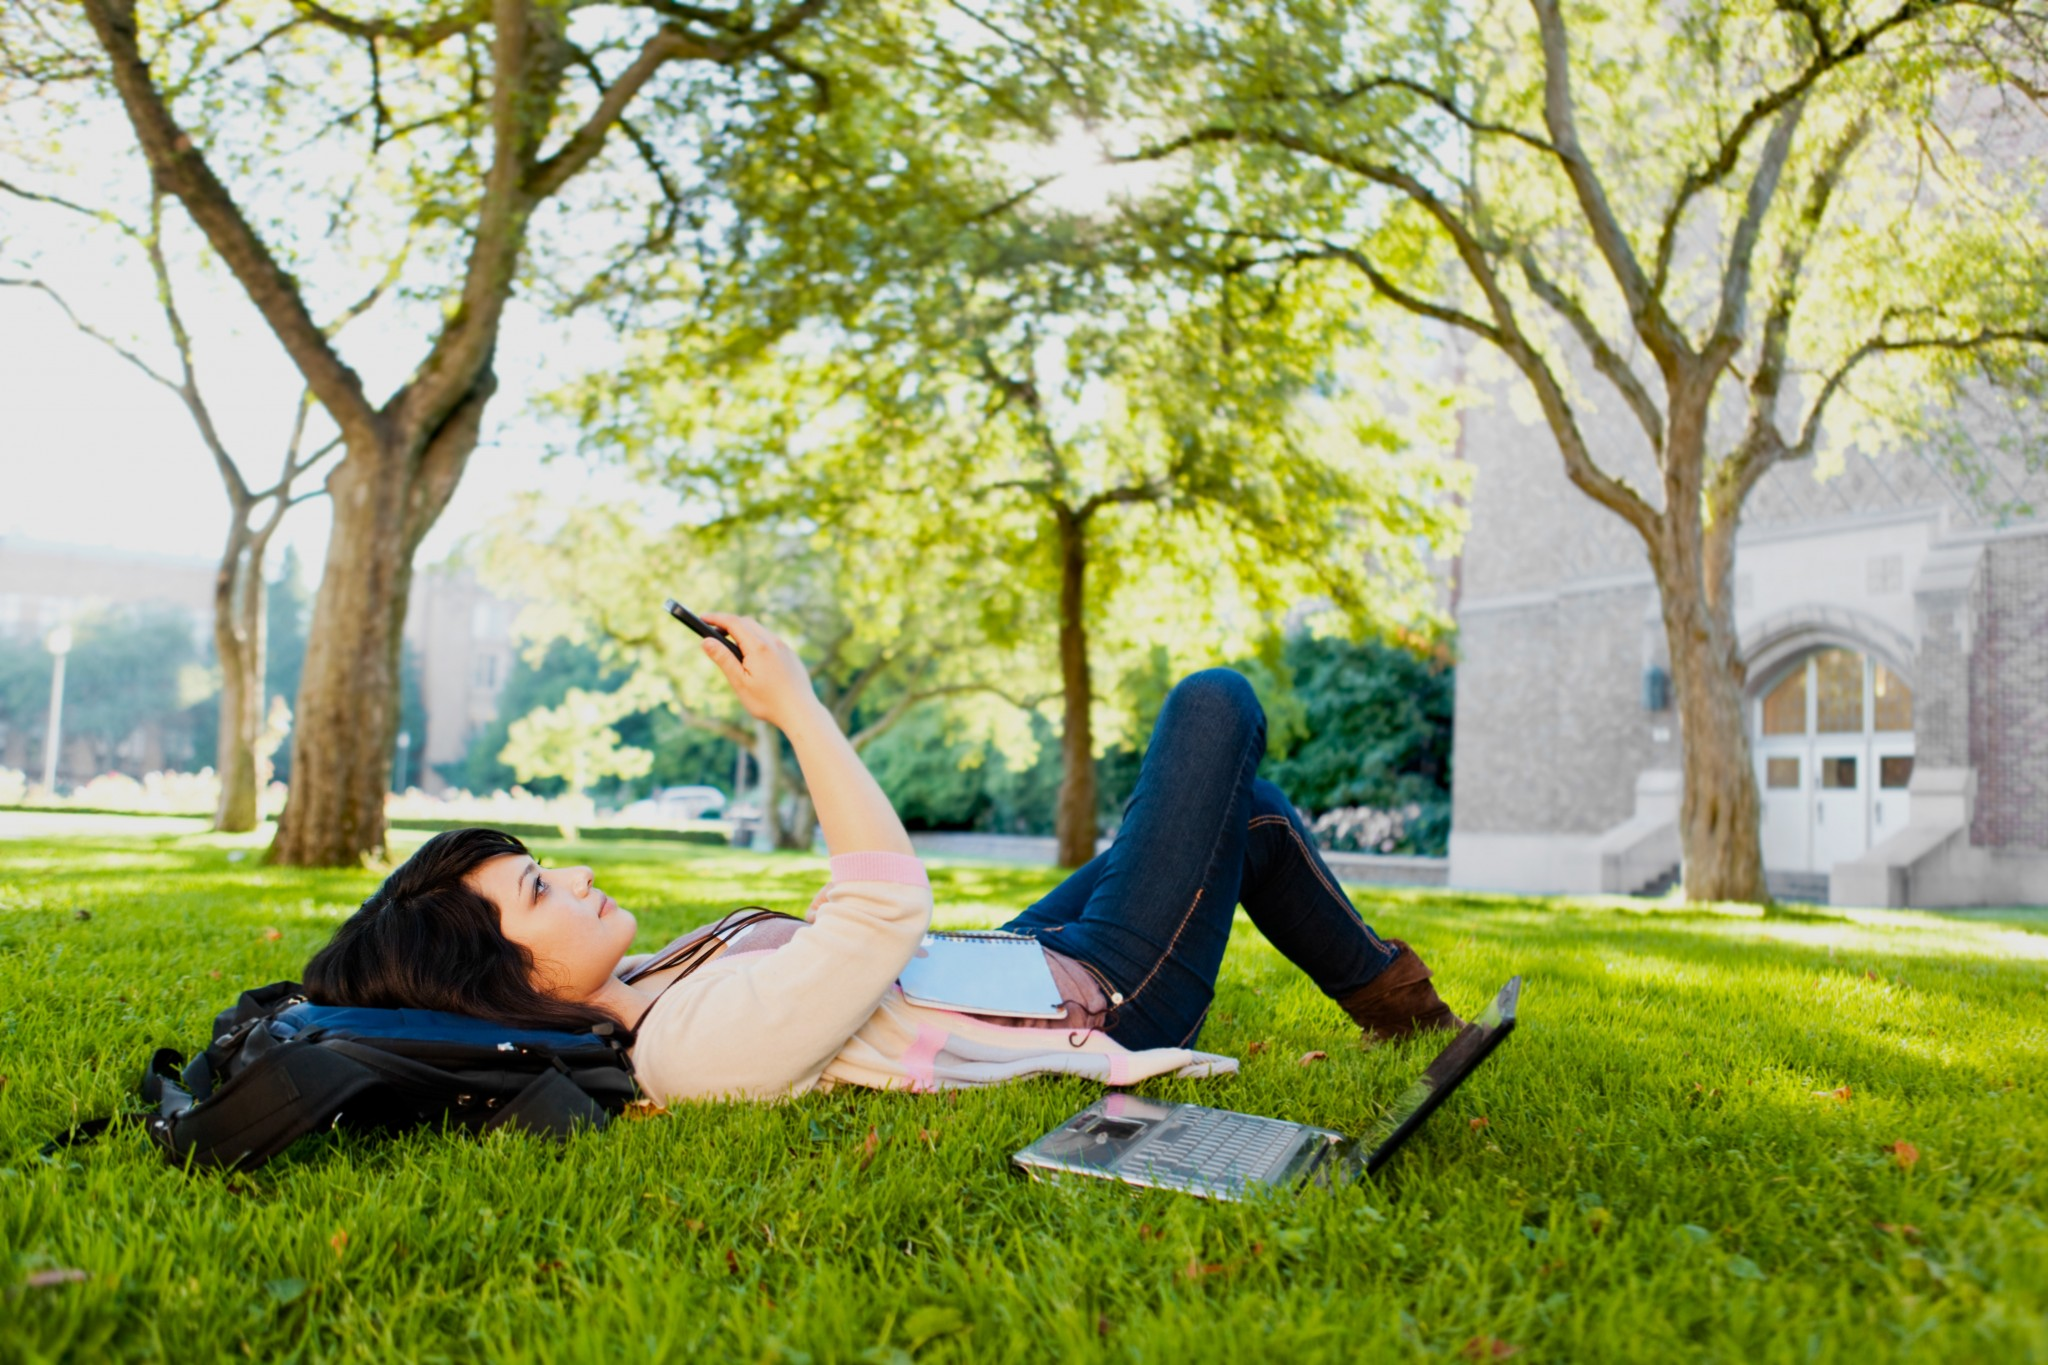 Digital device trends among international students